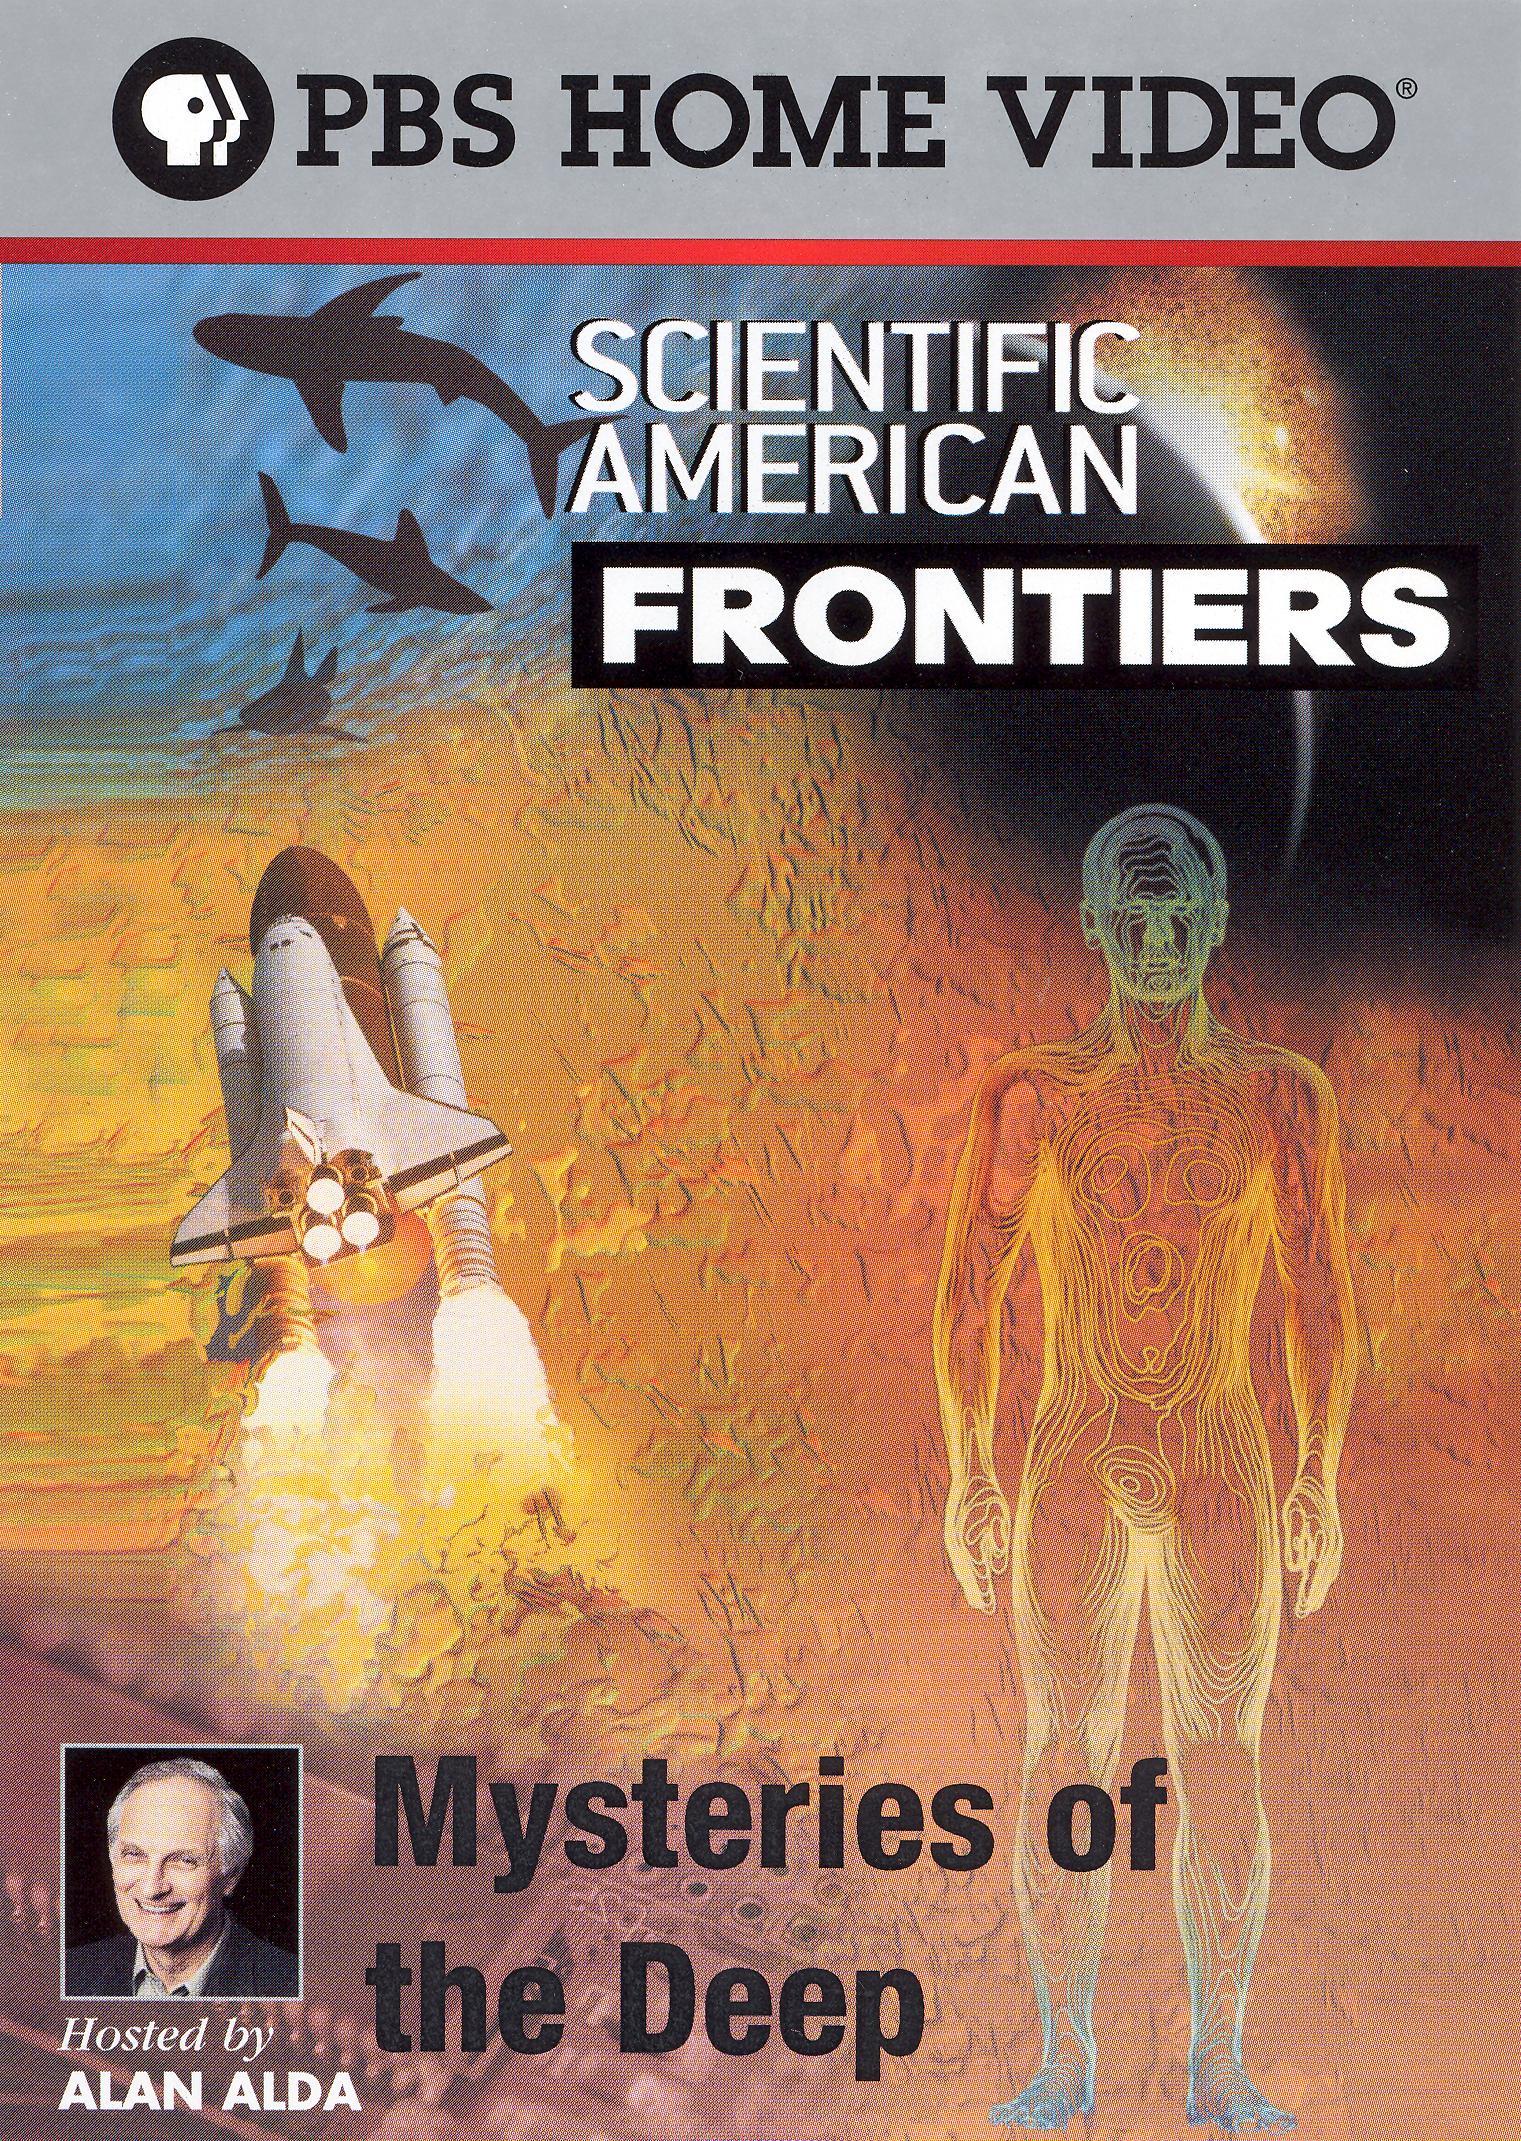 Scientific American Frontiers: Mysteries of the Deep